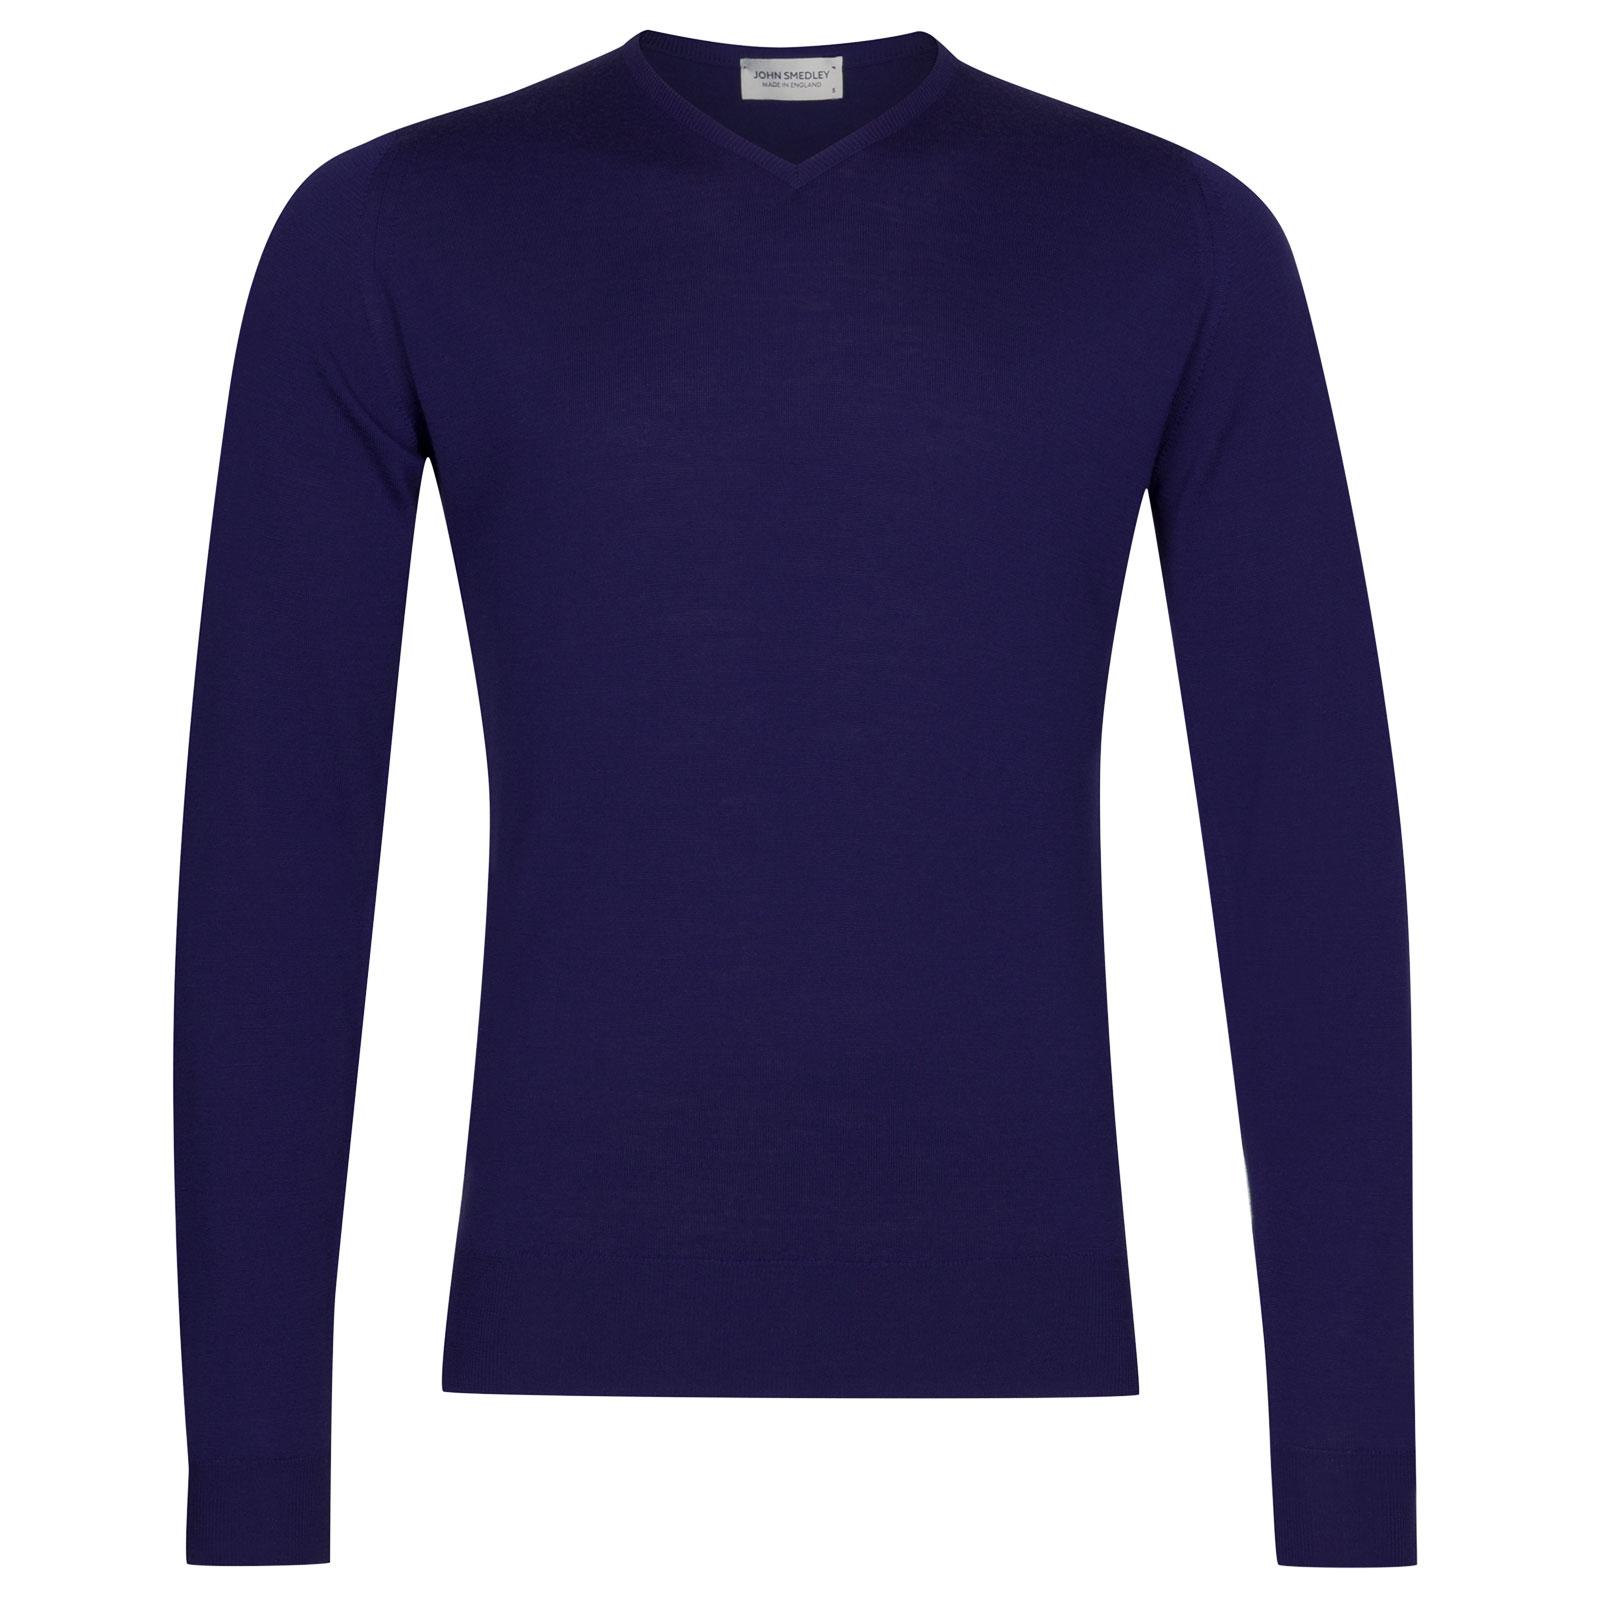 John Smedley Shipton Merino Wool Pullover in Serge Blue-XL